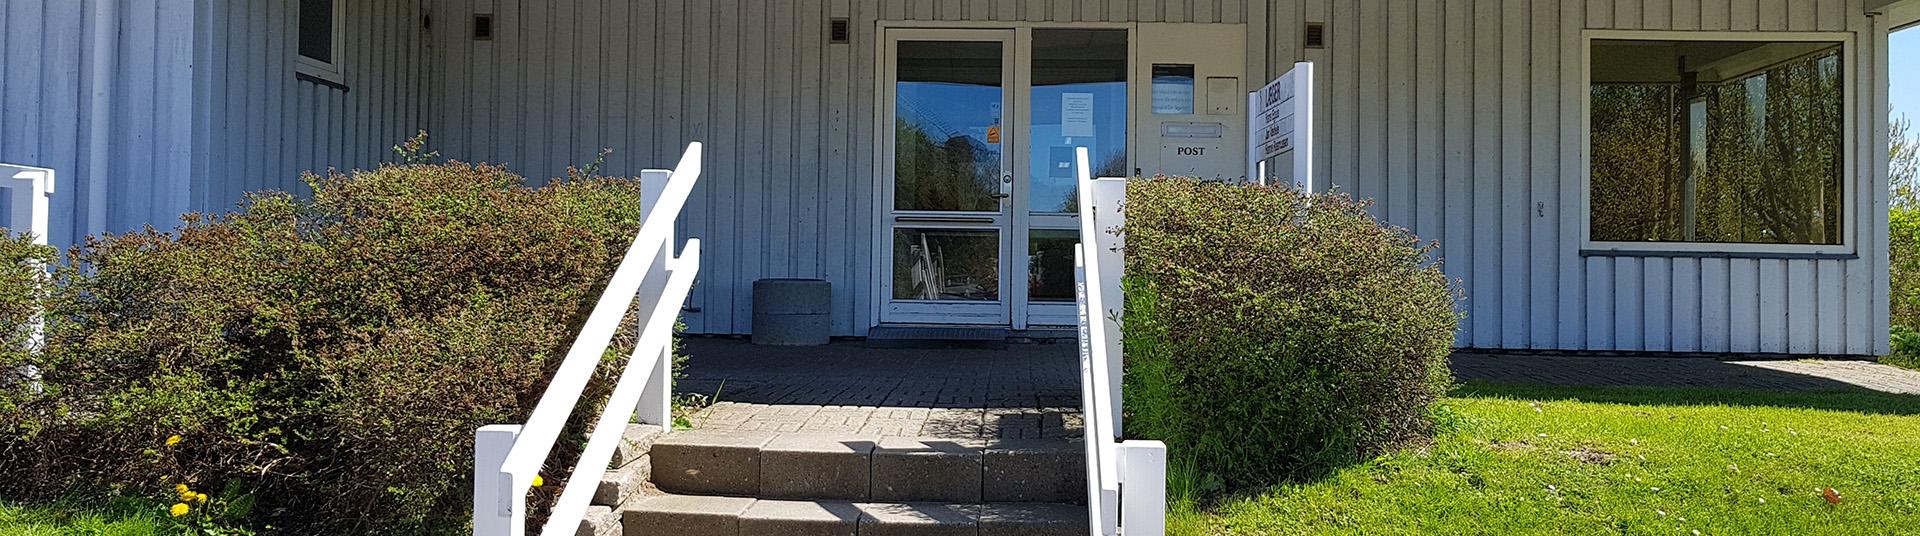 Lægehuset Rudkøbing